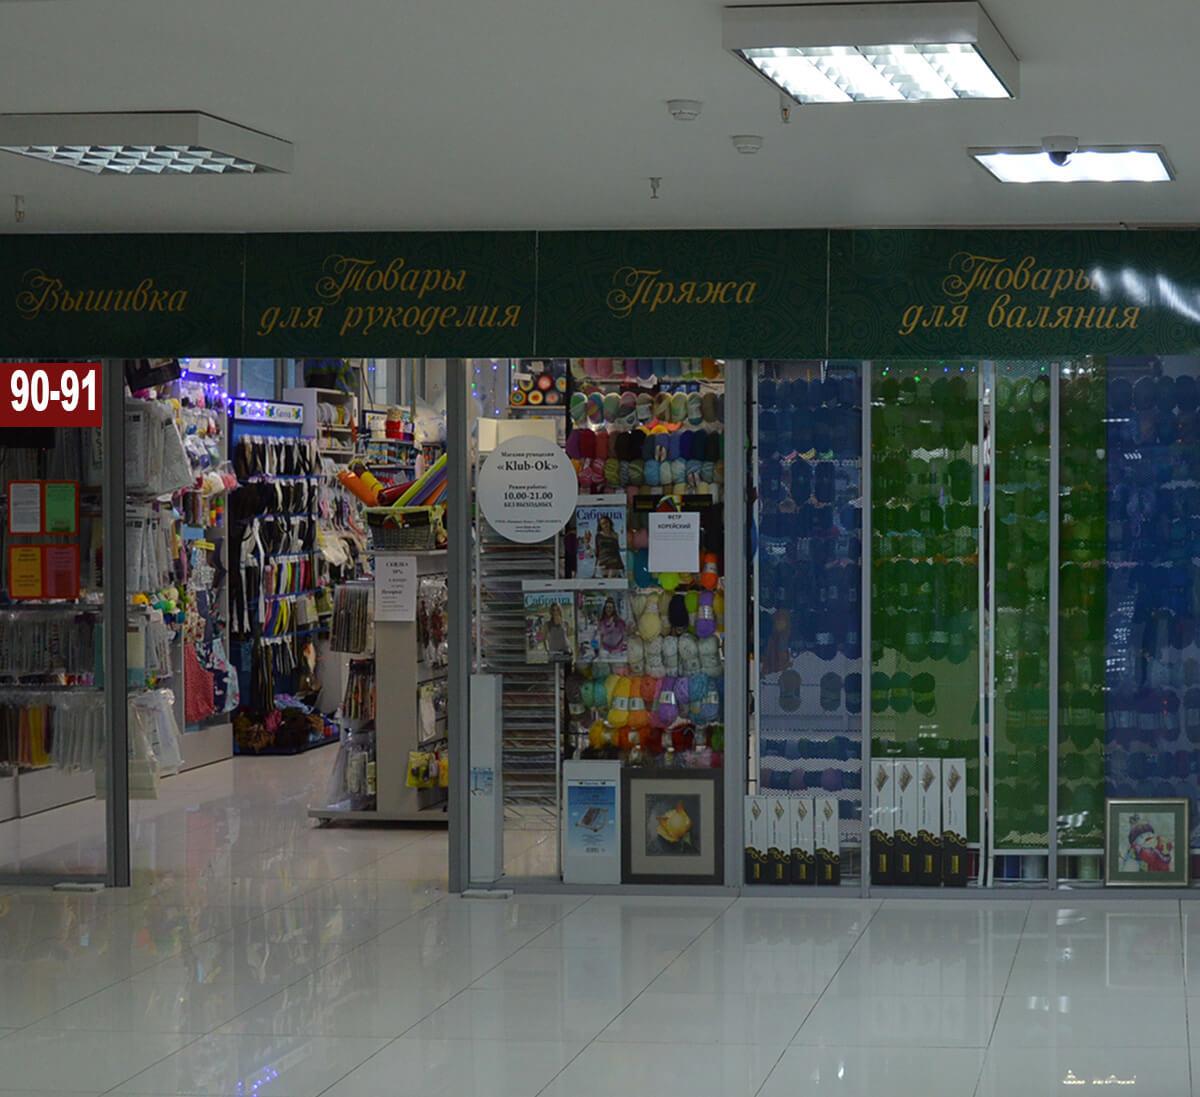 Klub-OK - магазин товаров для рукоделия на 3-м этаже в павильоне №90-91